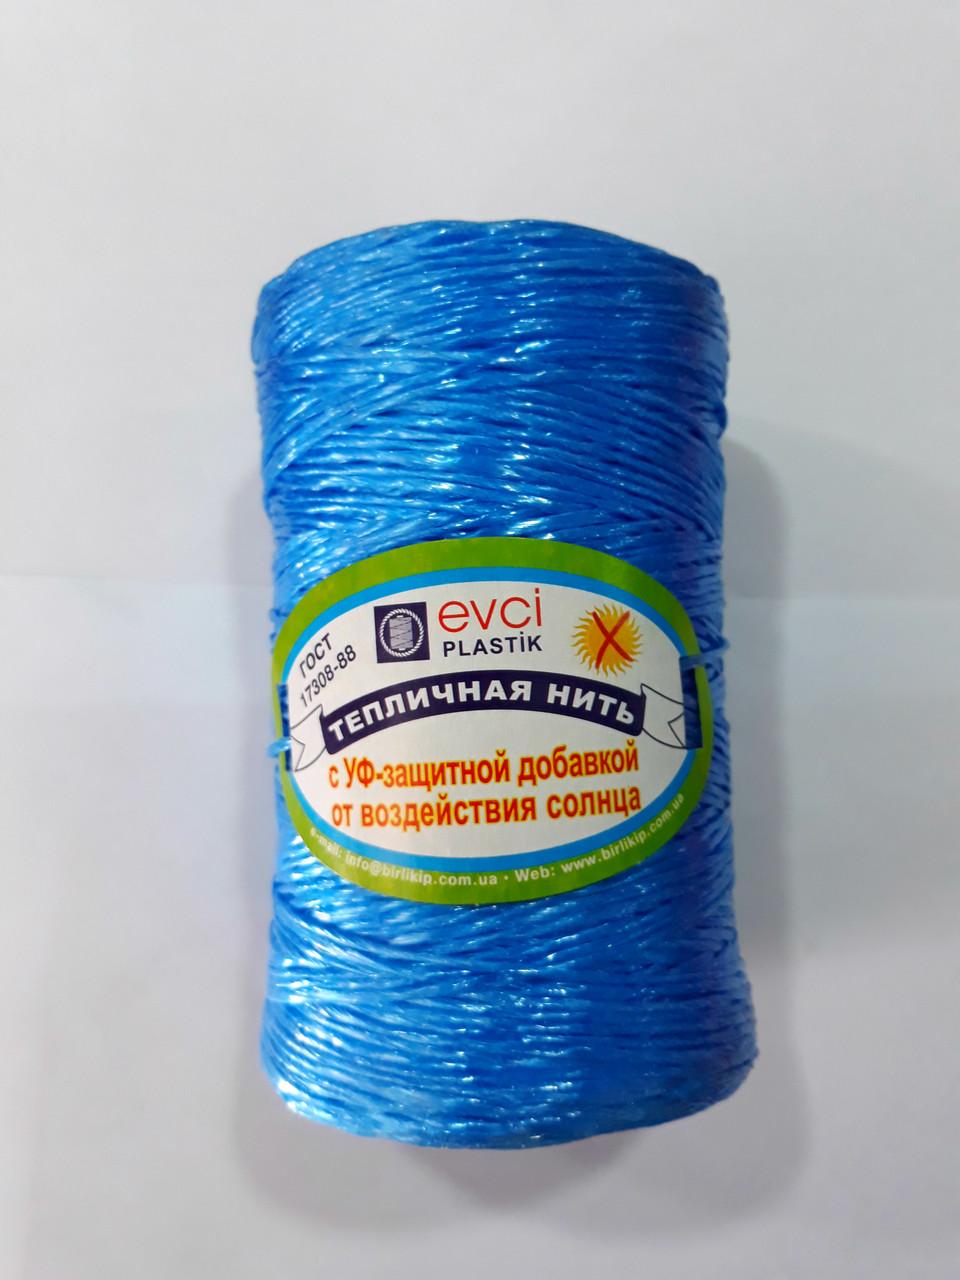 "Шпагат полипропиленовый 500грм/760метров.1мм диаметр ""Evci Plastic"" (Турция)."